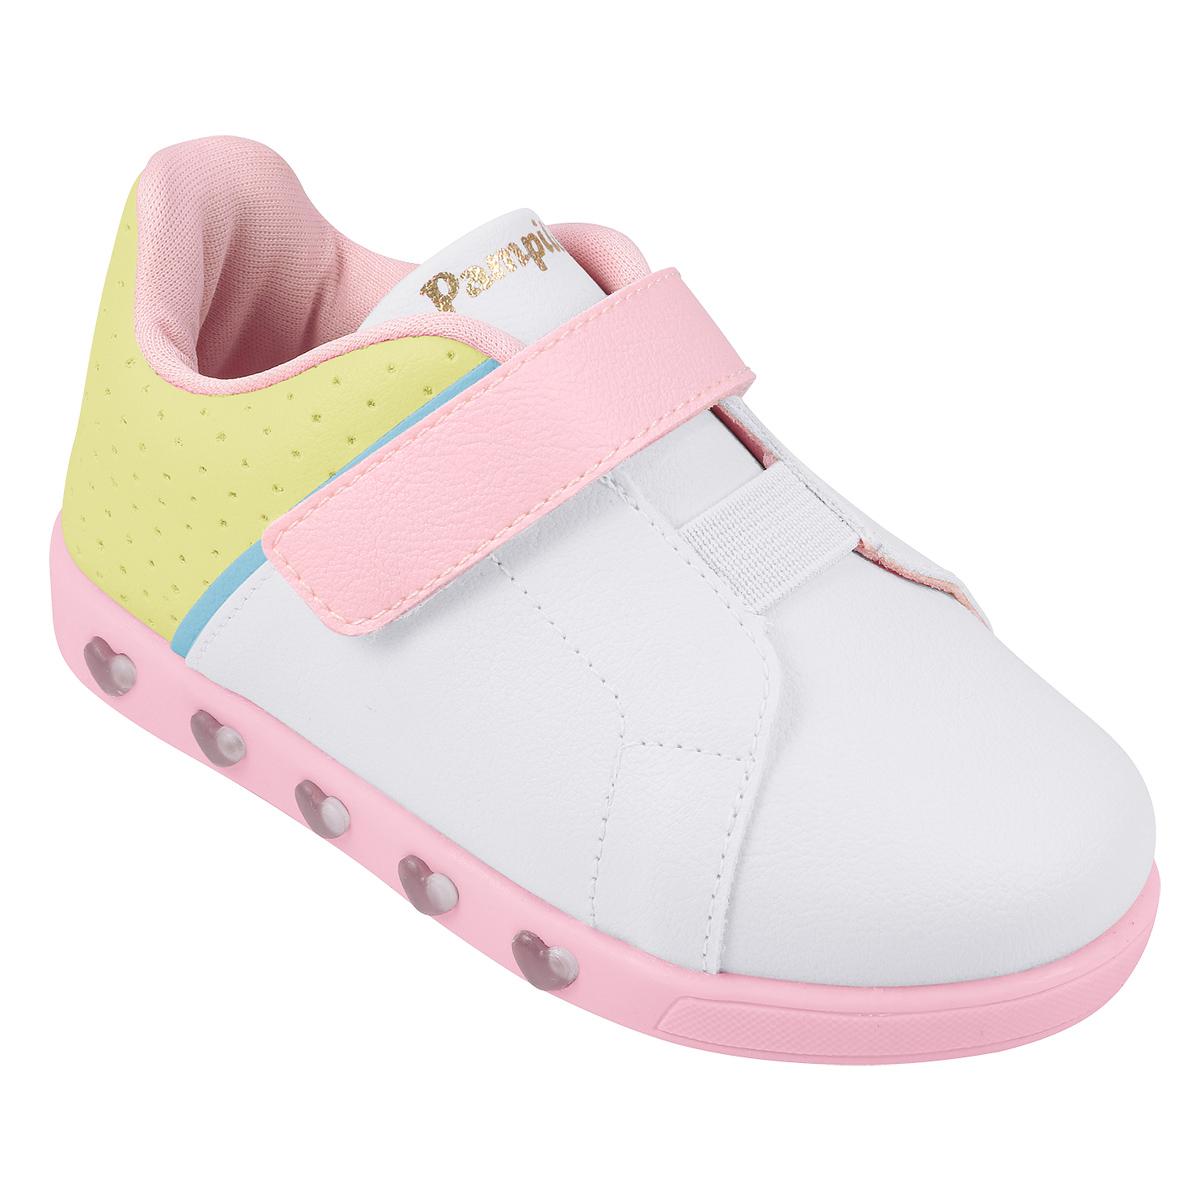 Tenis Pampili Feminino Infantil Sneaker Luz